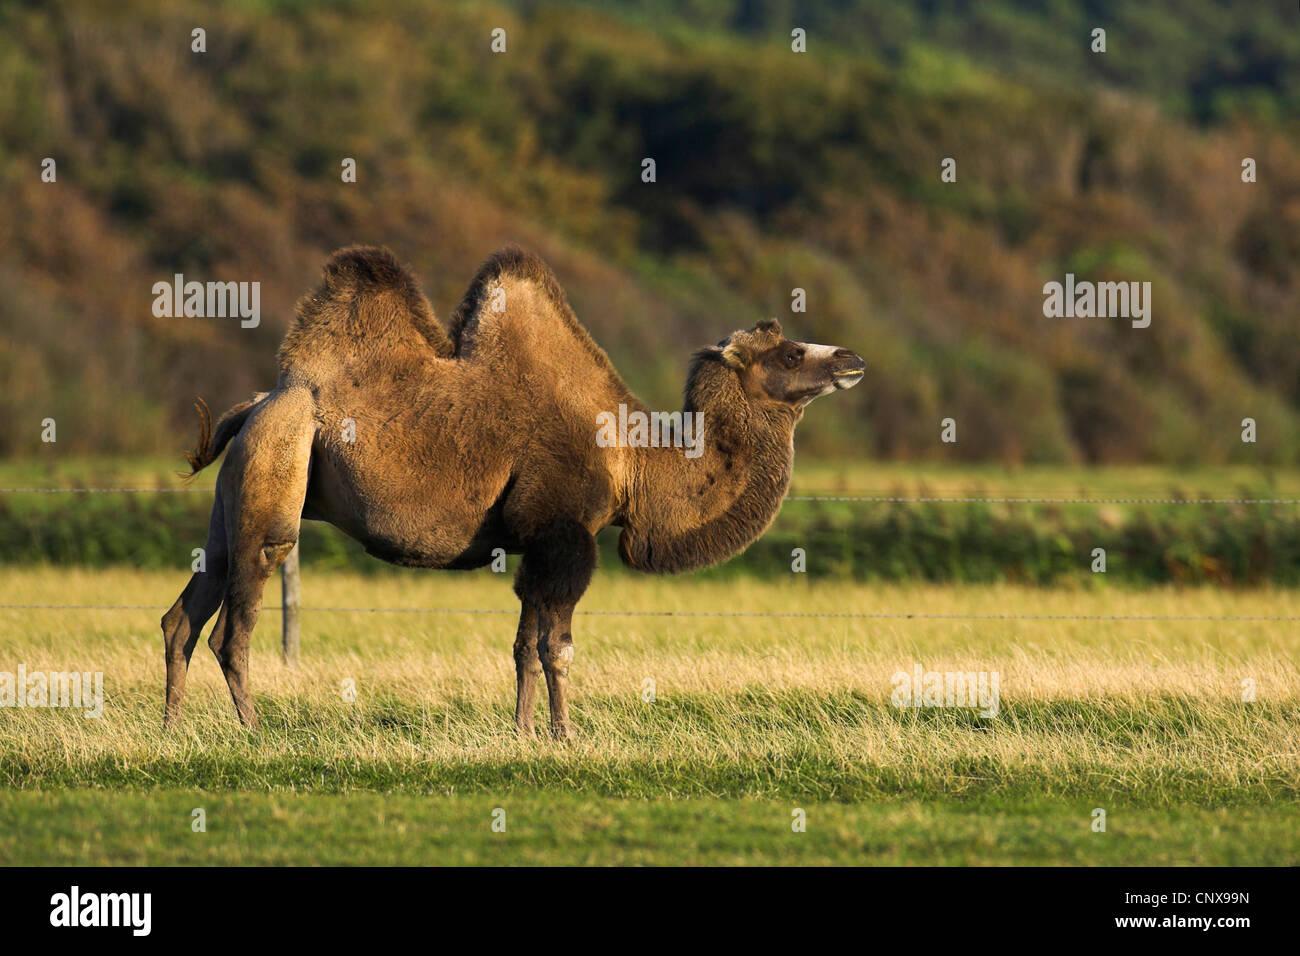 Bactrian Camel Two Humped Camelus Bactrianus Standing In A Meadow Netherlands De Petten